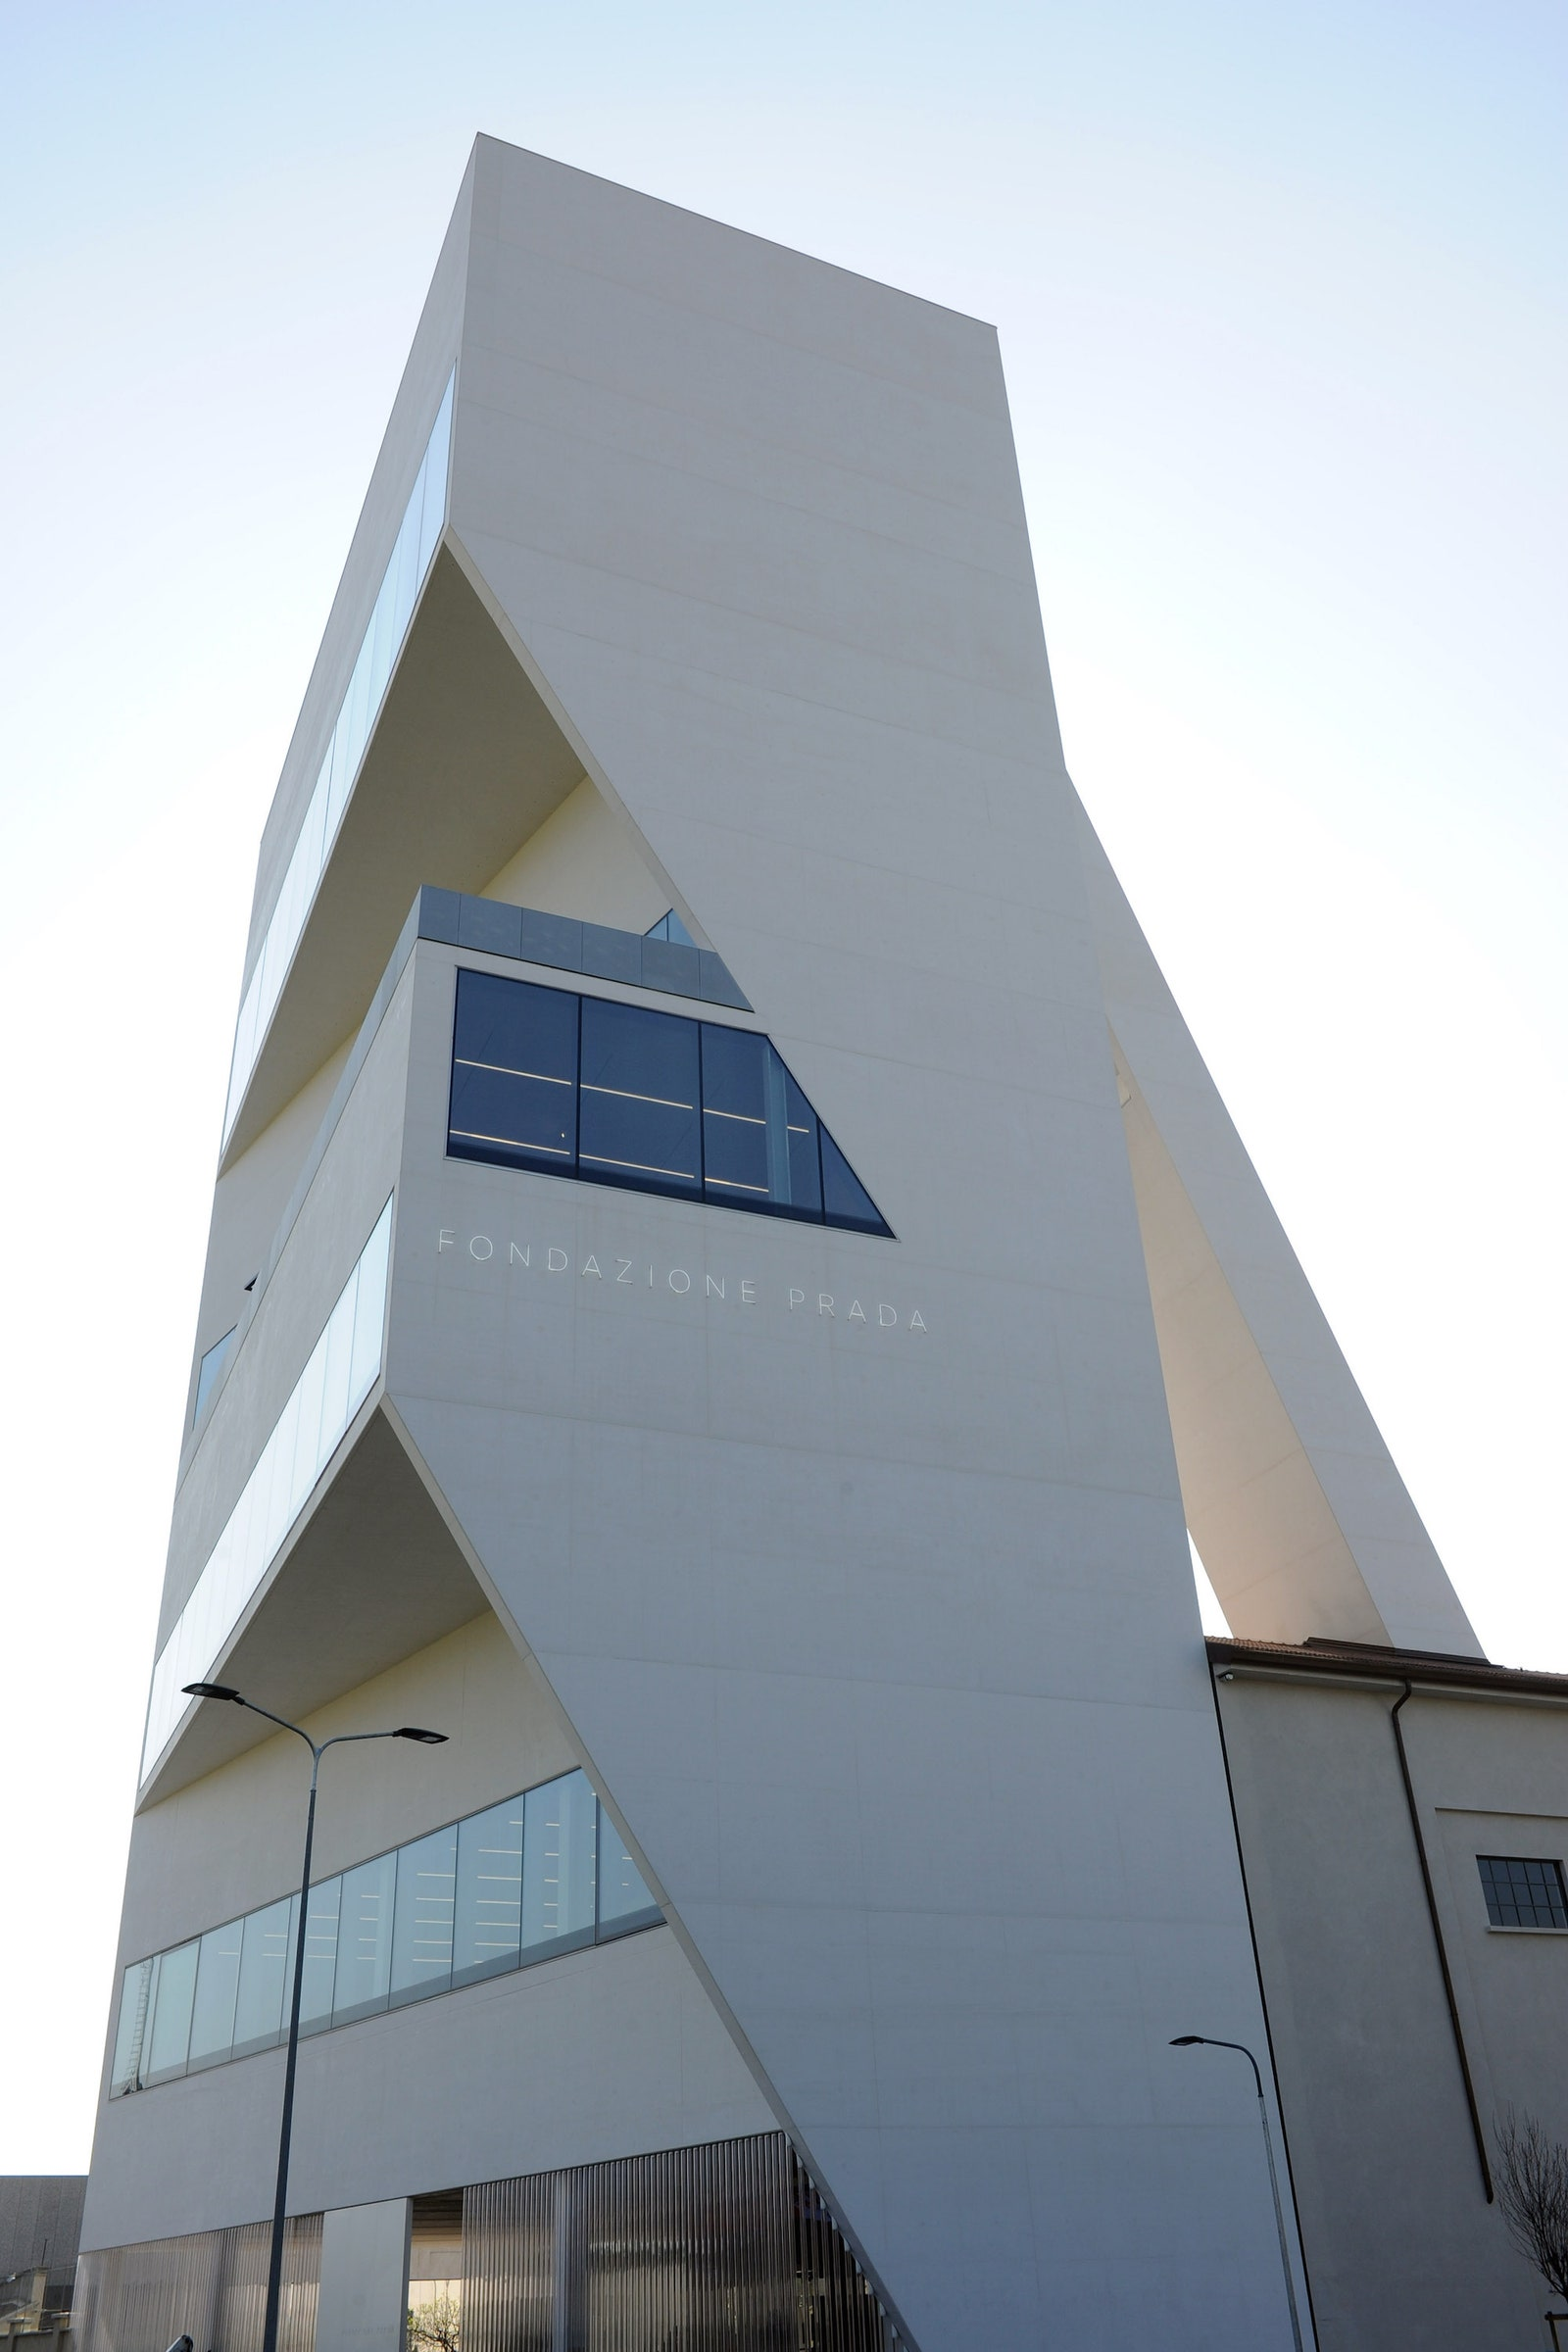 Fondazione Prada      .  GettyImages.